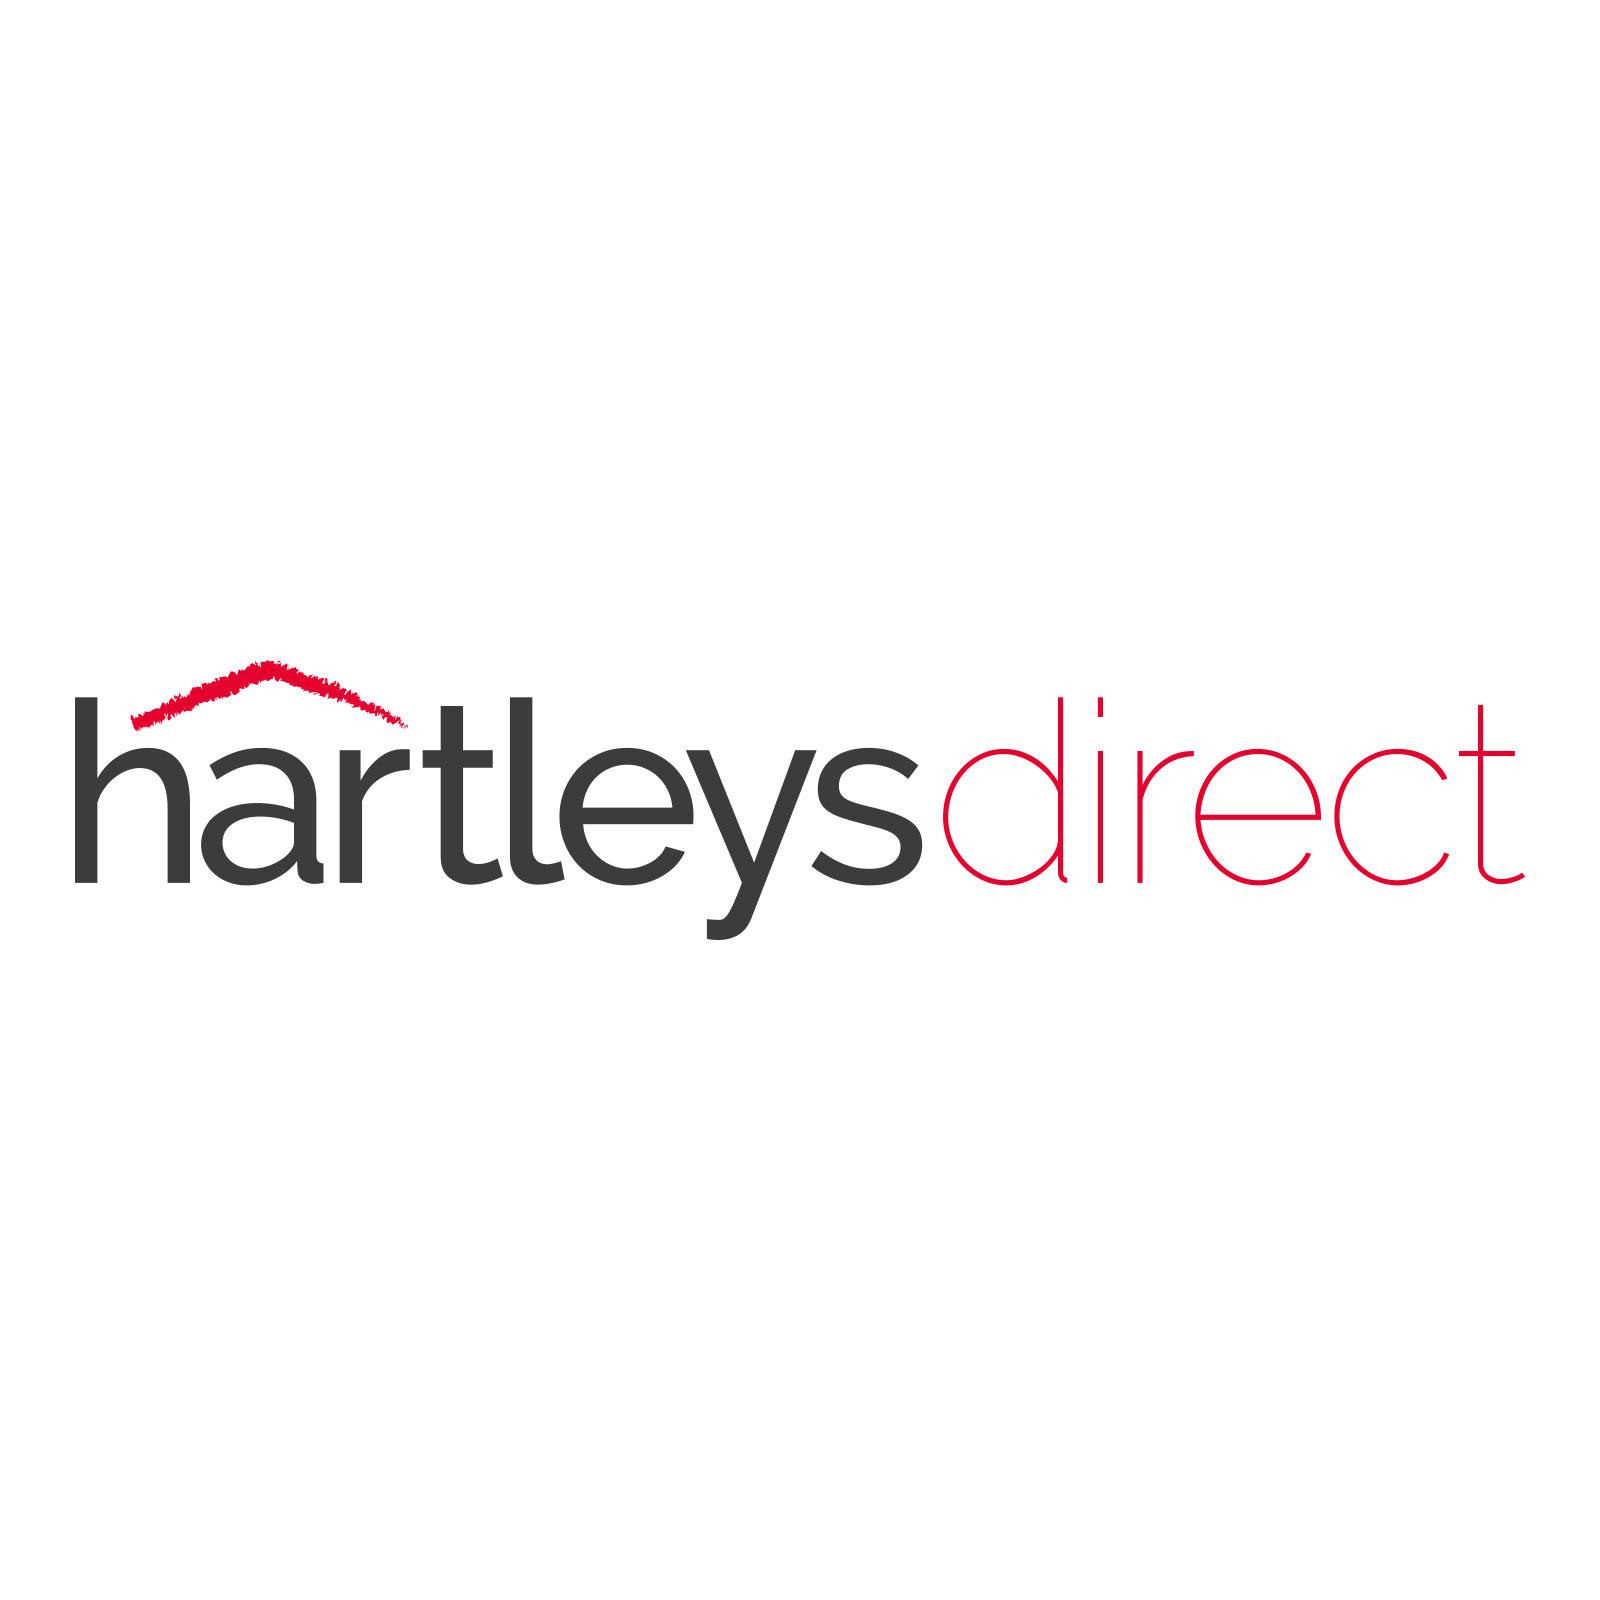 Hartleys-Grey-Stair-Basket-on-White-Background.jpg